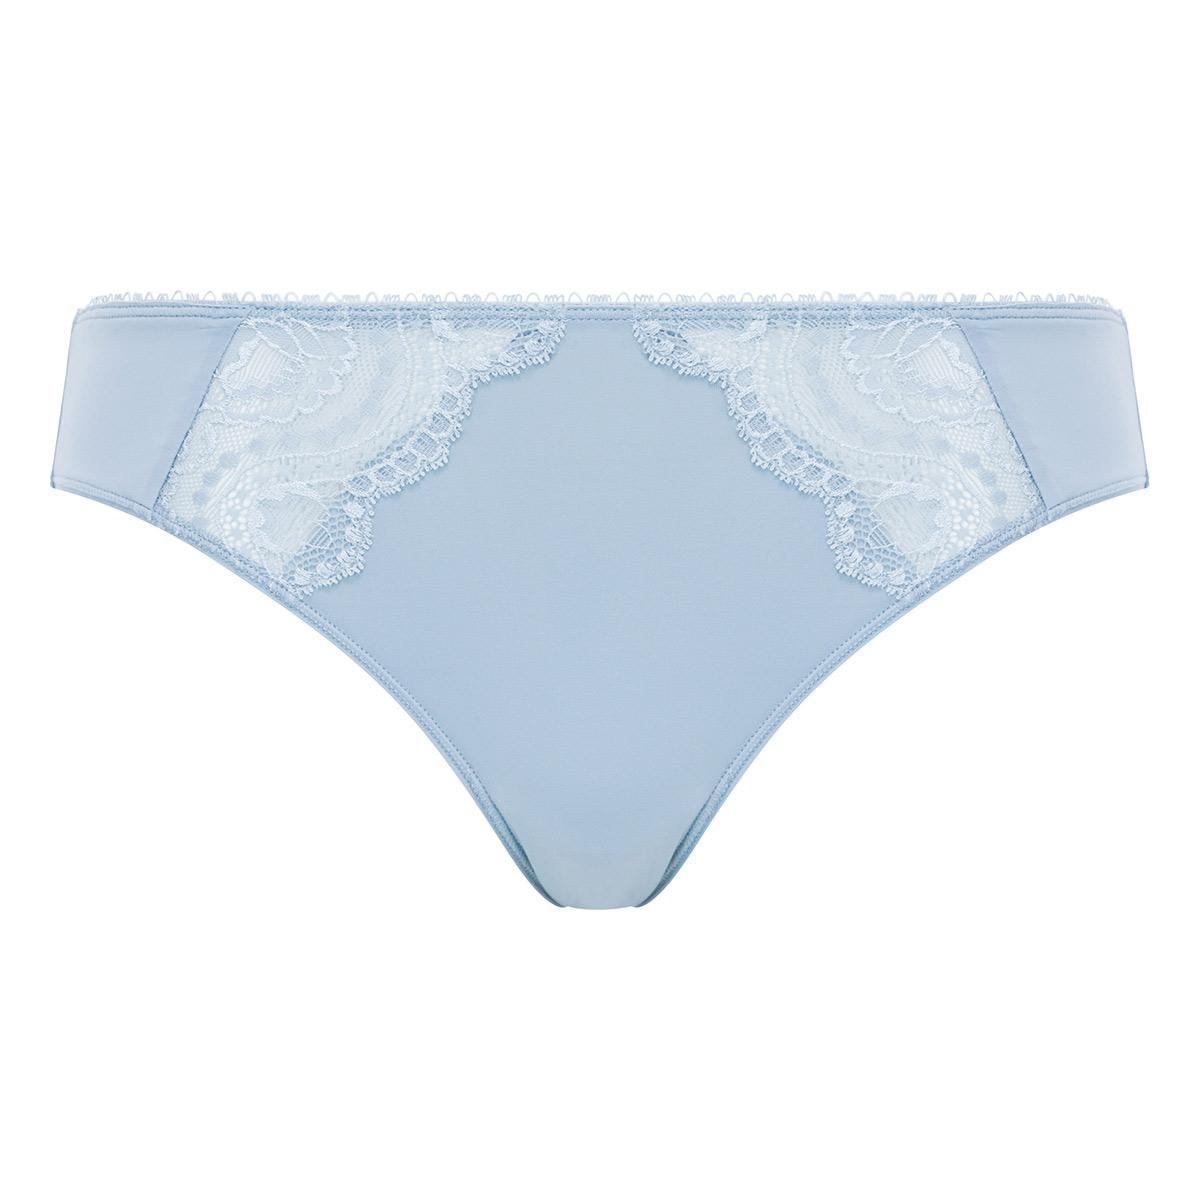 Slip Mini in pizzo grigio azzurrognolo - Flowery Lace - PLAYTEX